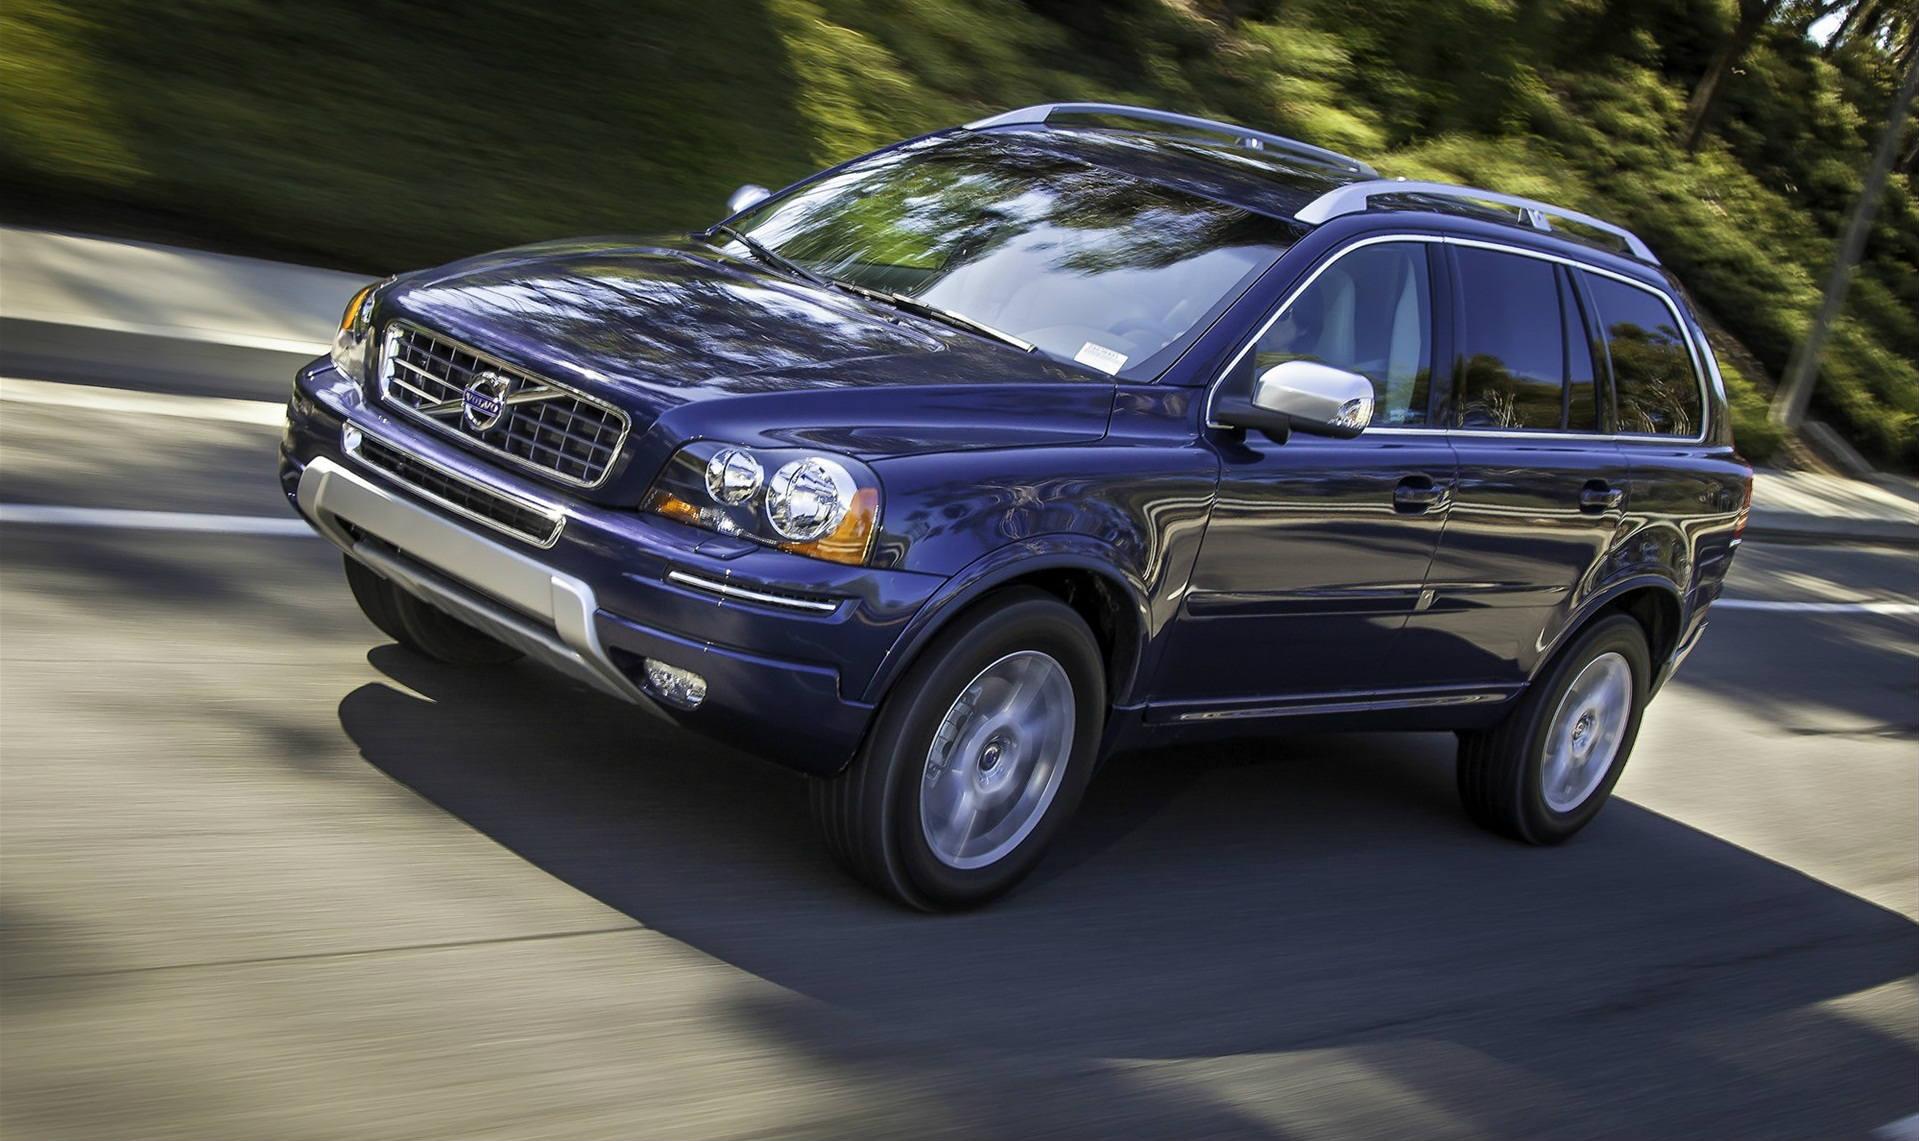 105681 скачать обои Вольво (Volvo), Тачки (Cars), Вид Сбоку, 2015, Volvo Xc90 Ii - заставки и картинки бесплатно